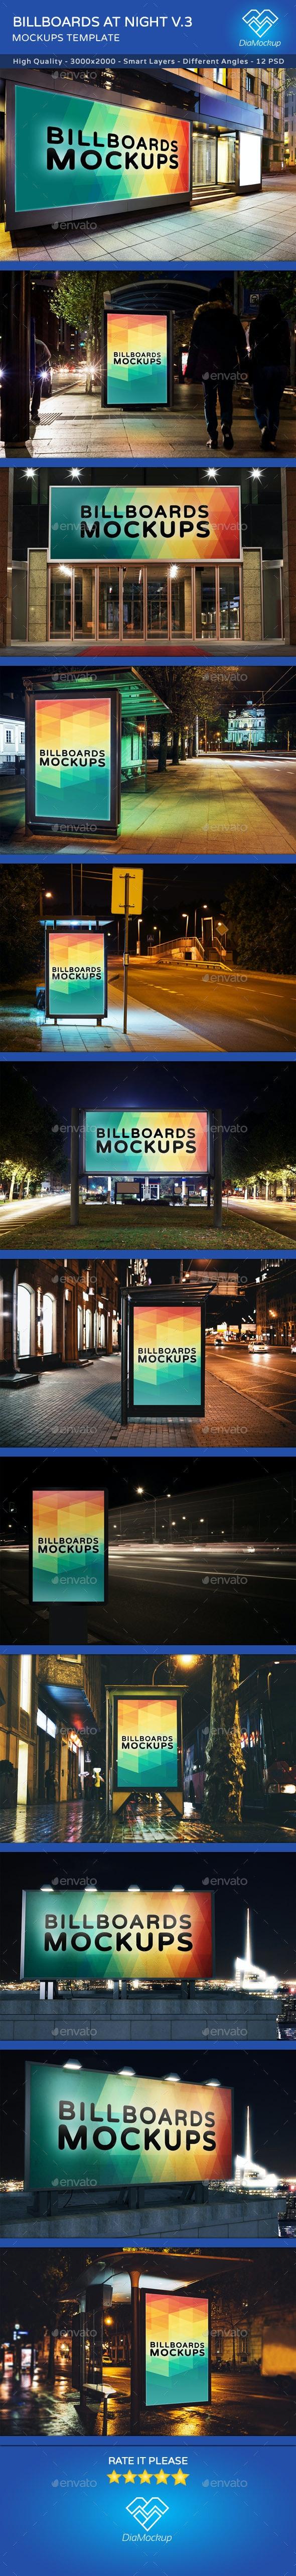 Billboards Mockups at Night Vol.3 - Posters Print